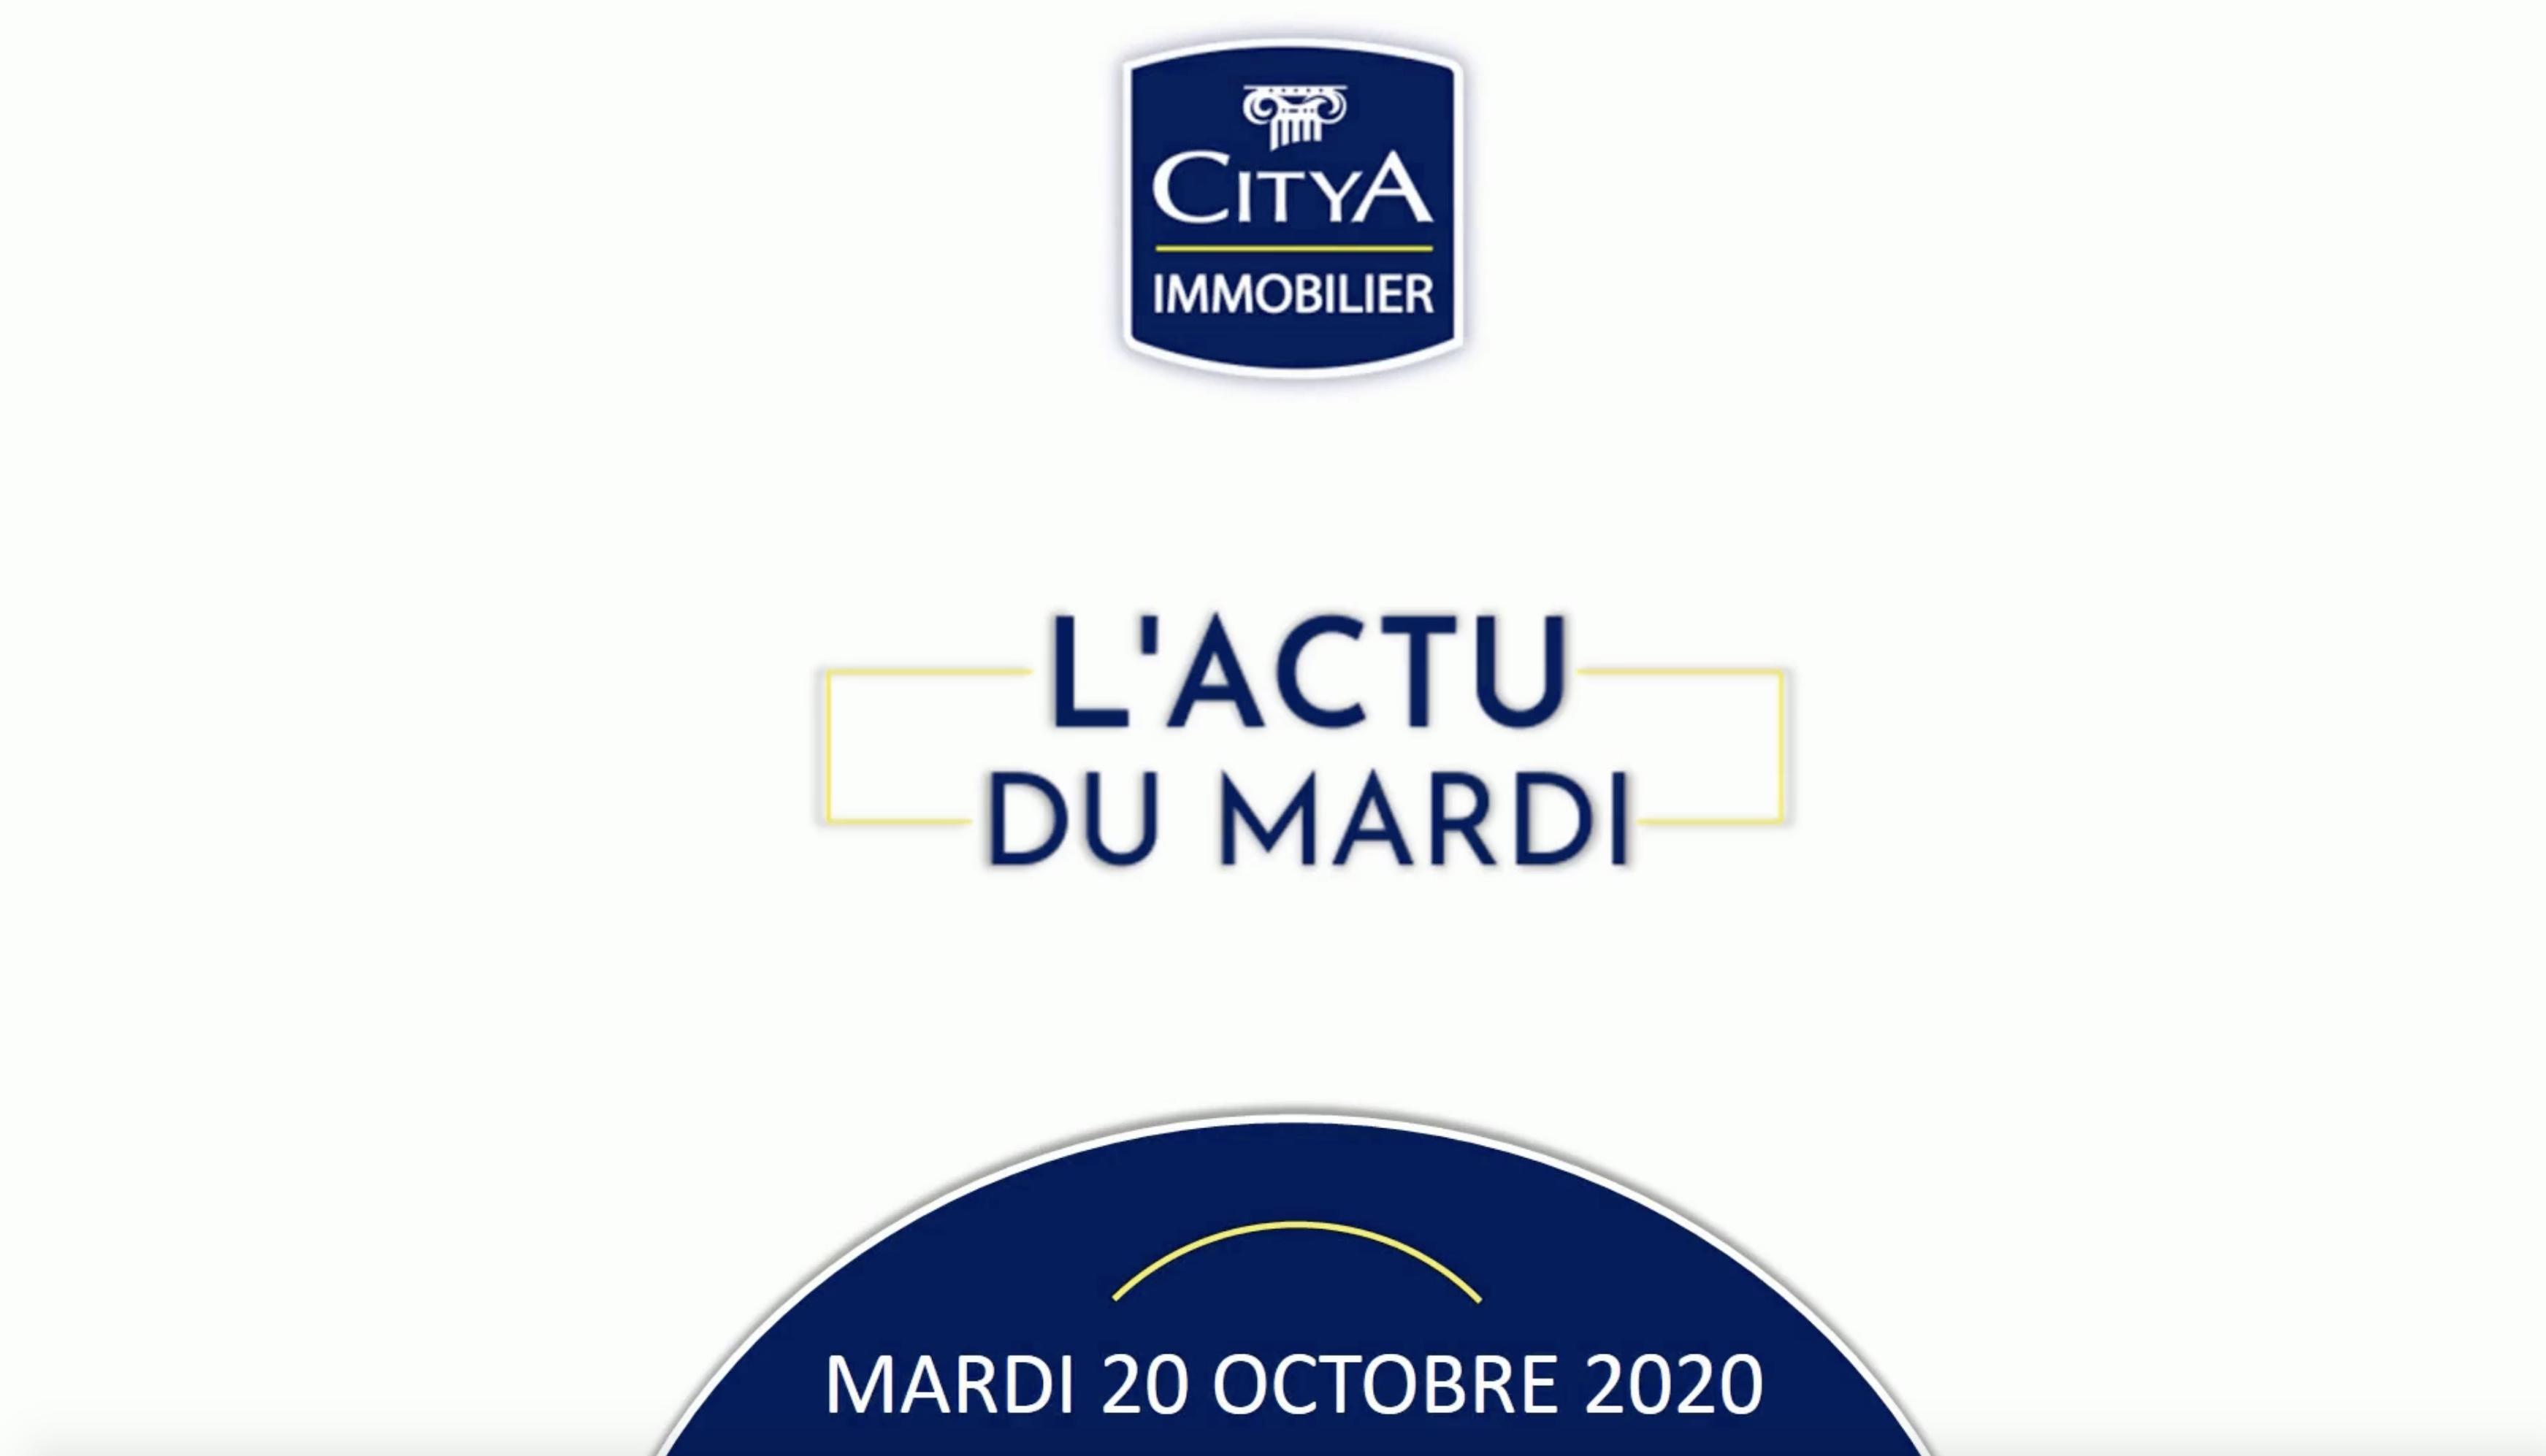 ACTU DU MARDI 20 OCTOBRE 2020 Citya Immobilier